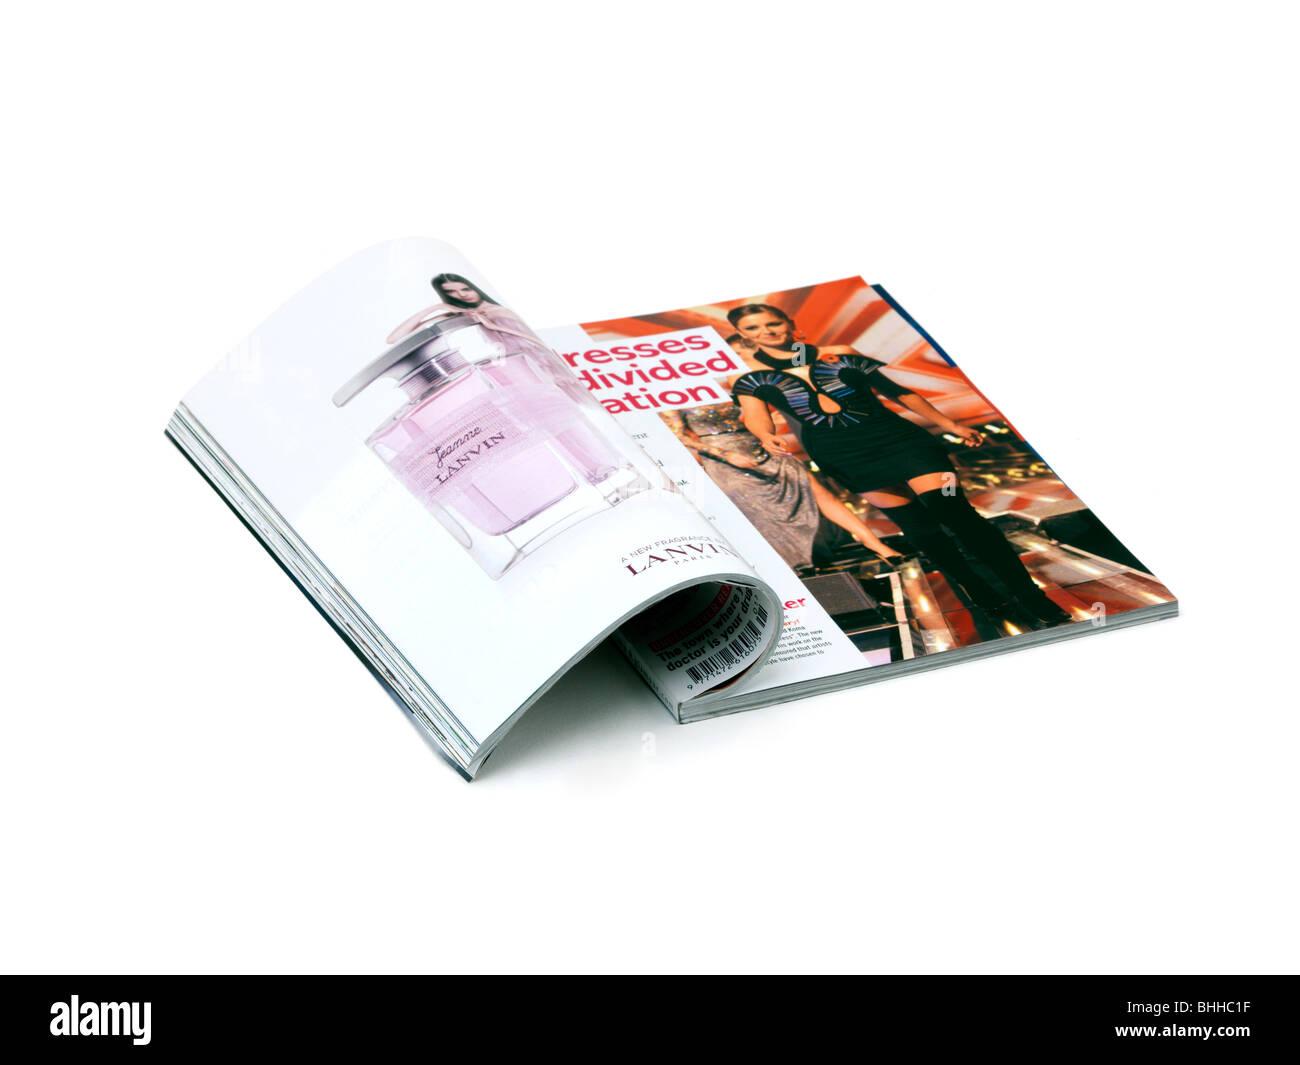 An Open Magazine - Stock Image